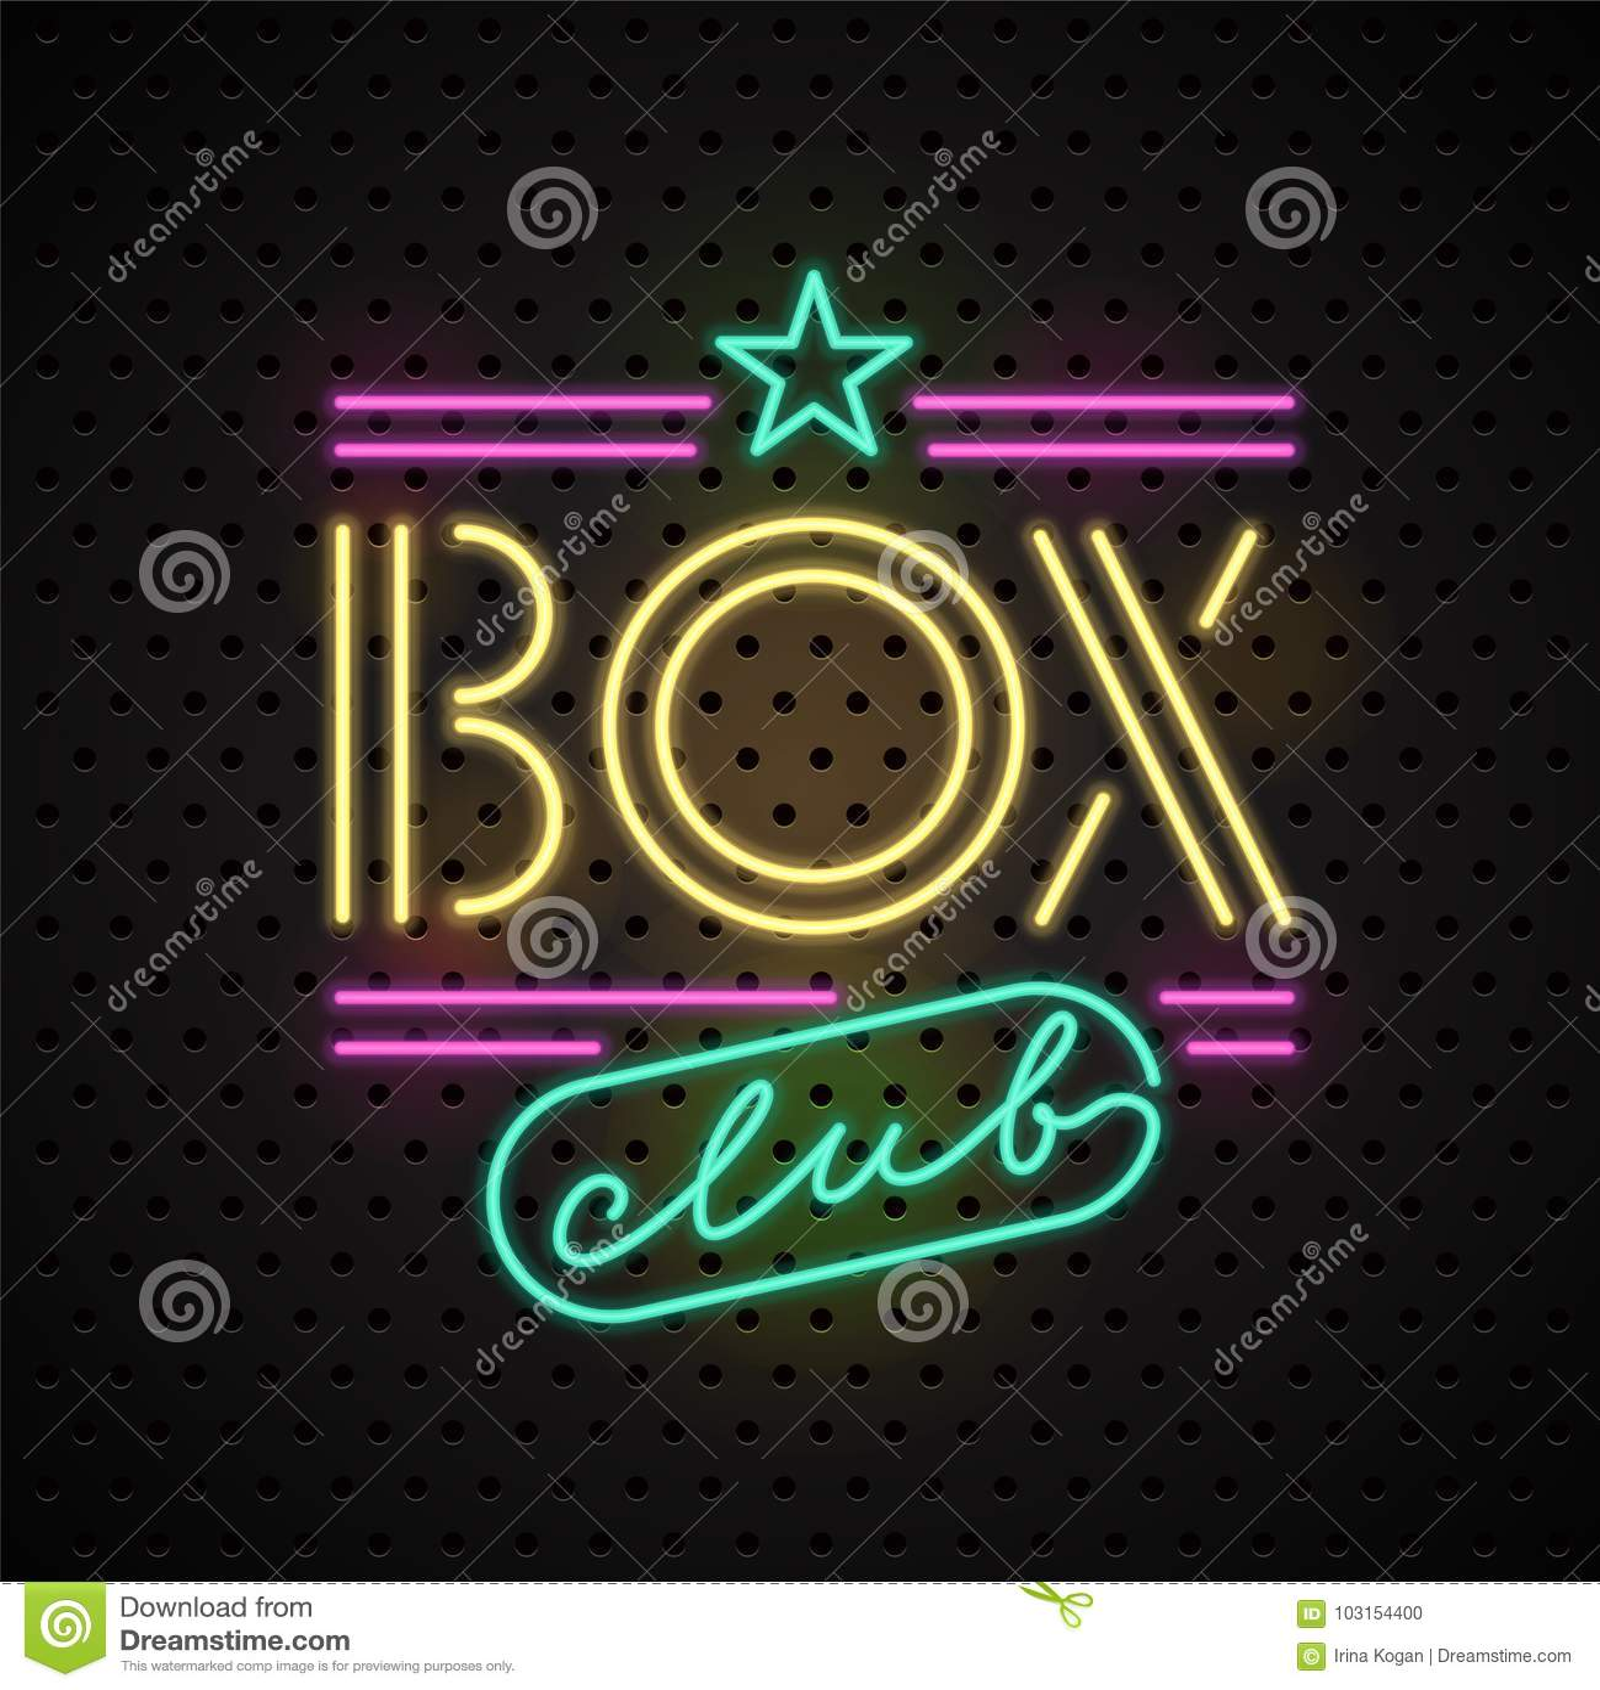 Neon sign for boxing club vector logo icon stock vector neon sign for boxing club vector logo icon buycottarizona Choice Image